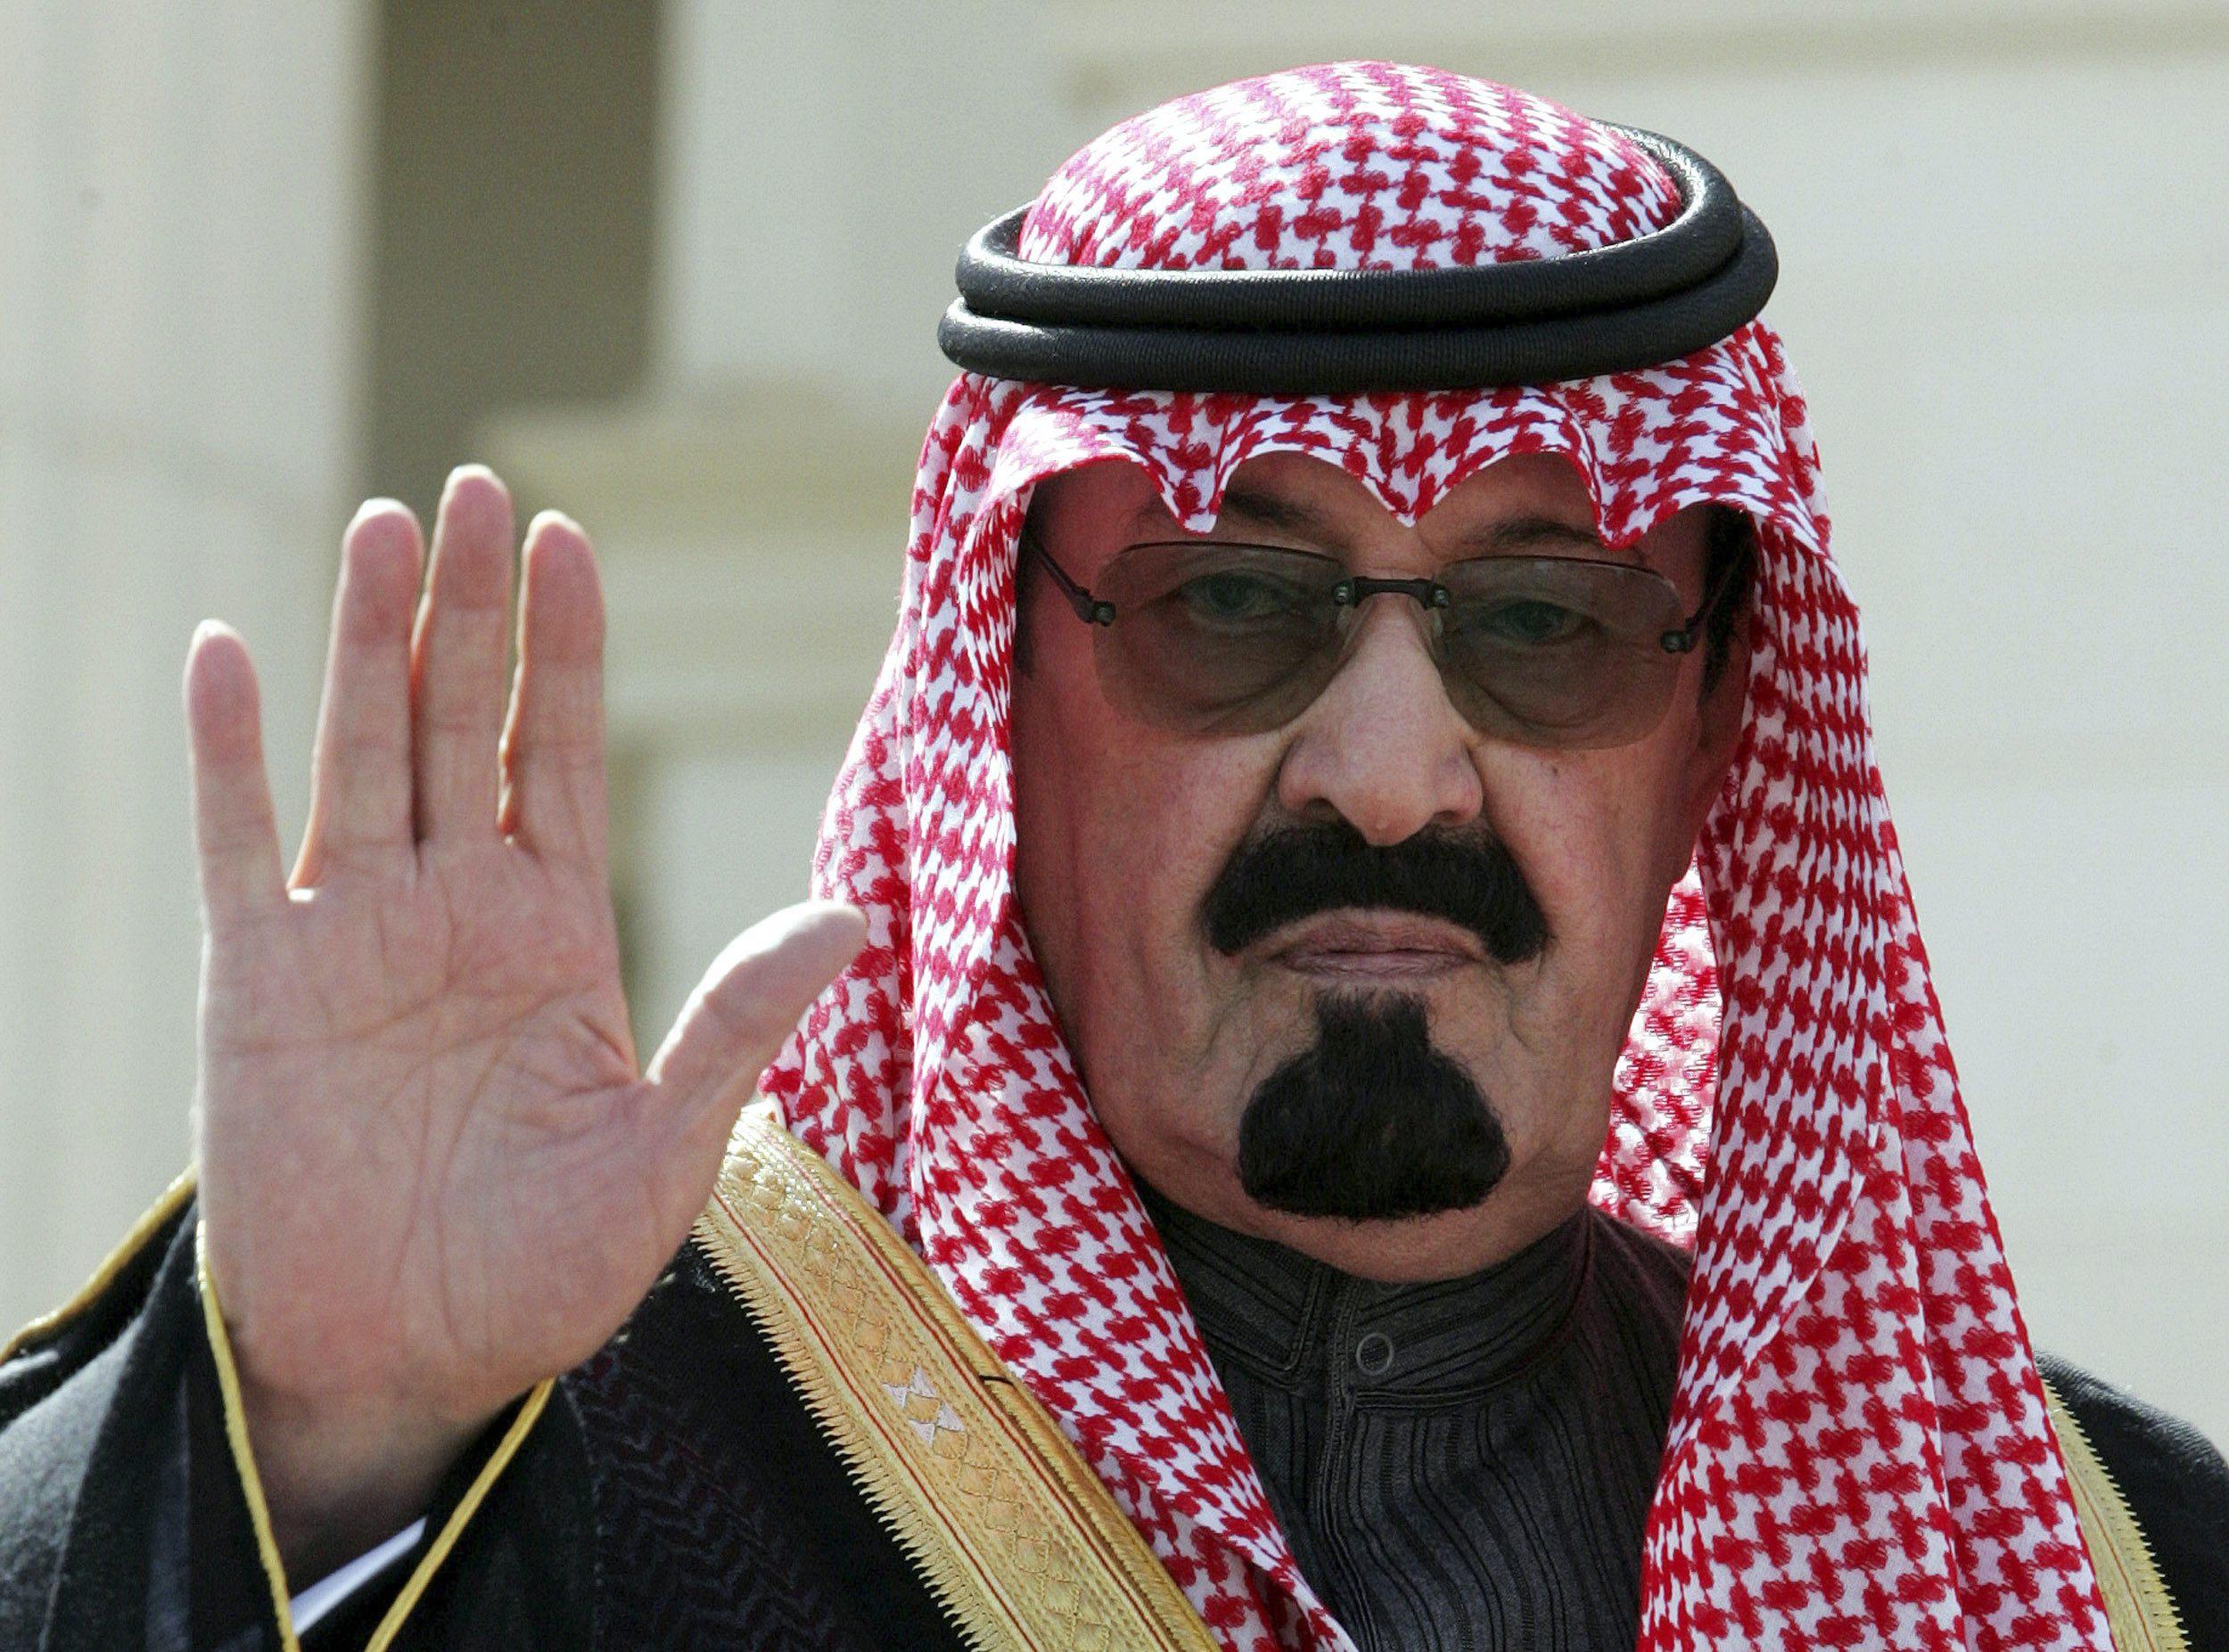 Fallece Rey Abdullah de Arabia Saudita